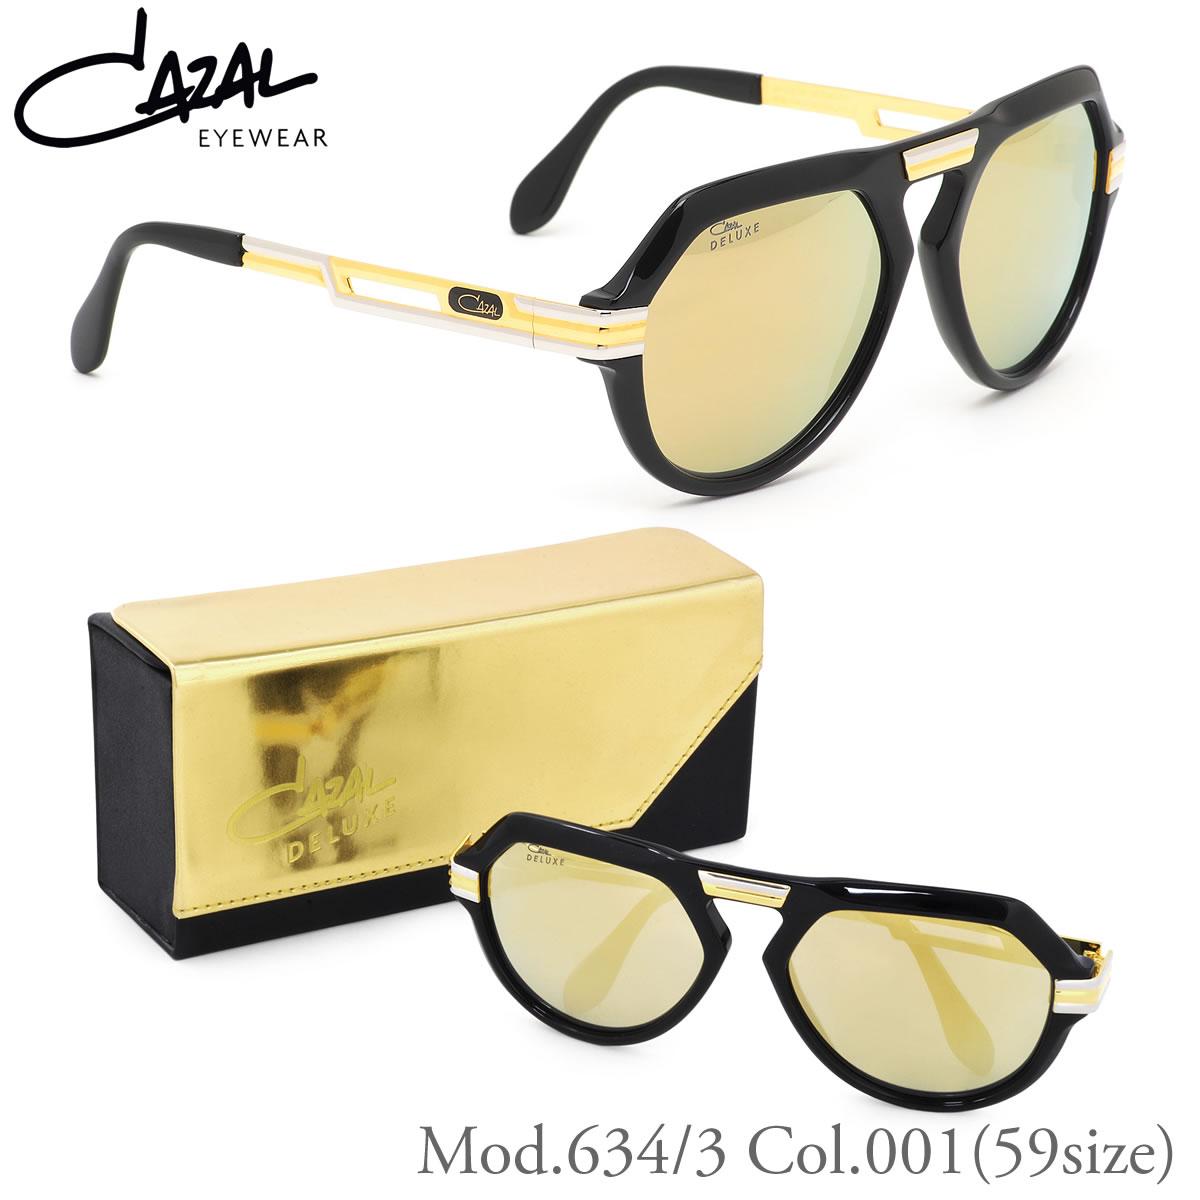 634 / 3 CAZAL 太阳镜 001 59 大小传说传说豪华豪华规格有限限量版眼泪滴镜子镜头 24 K 名人 CAZAL 男人女人